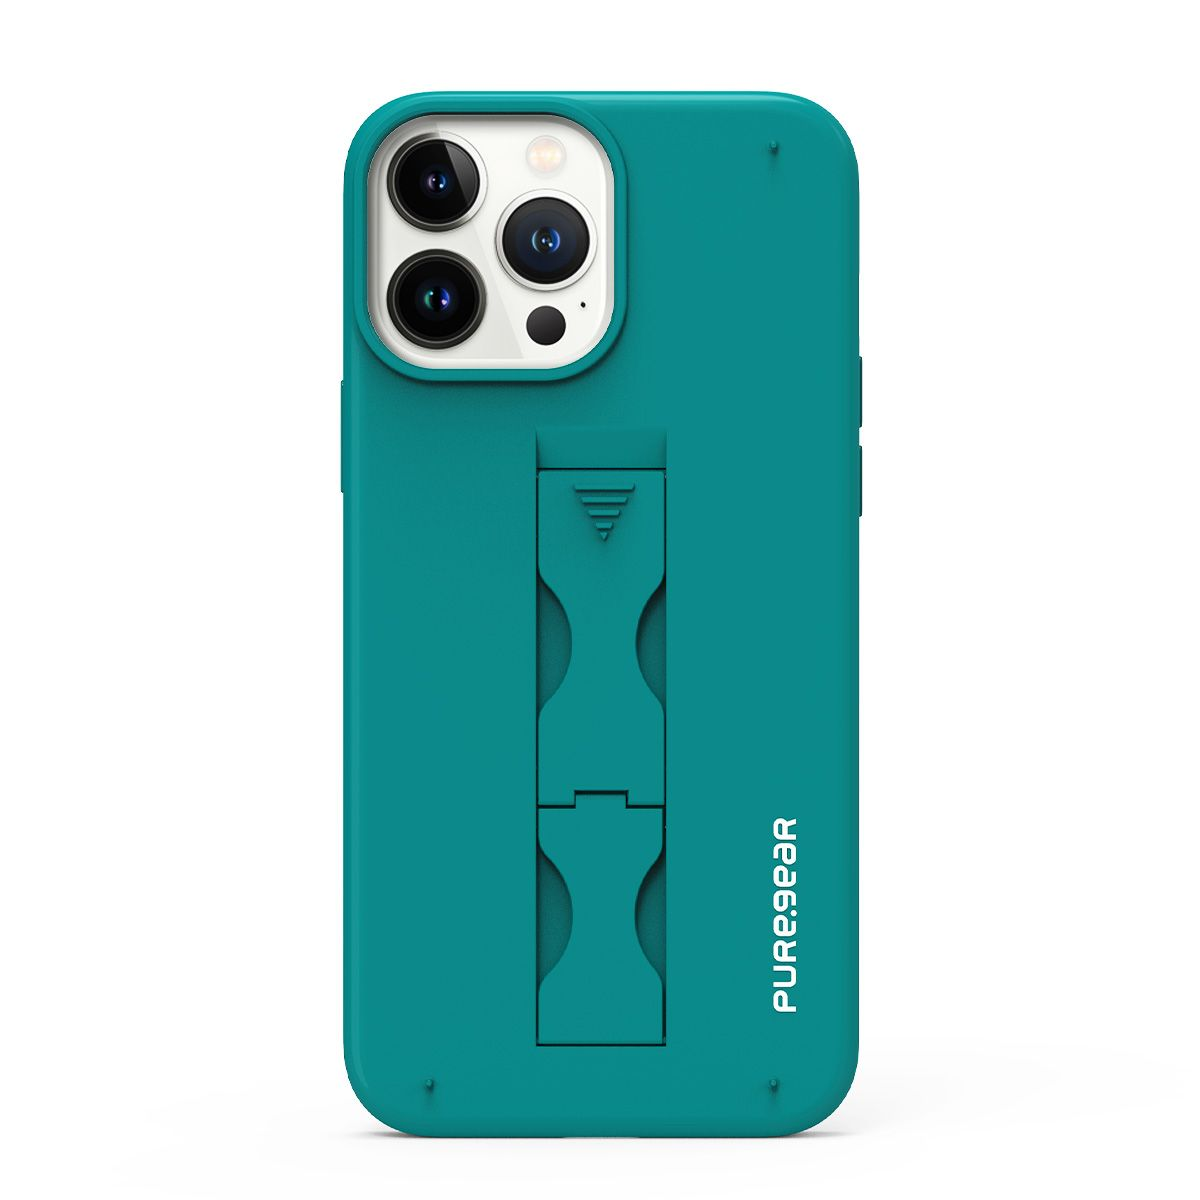 Apple iPhone 13 Pro Max  SlimStik, Antimicrobial Kickstand Case –  Blue Lagoon